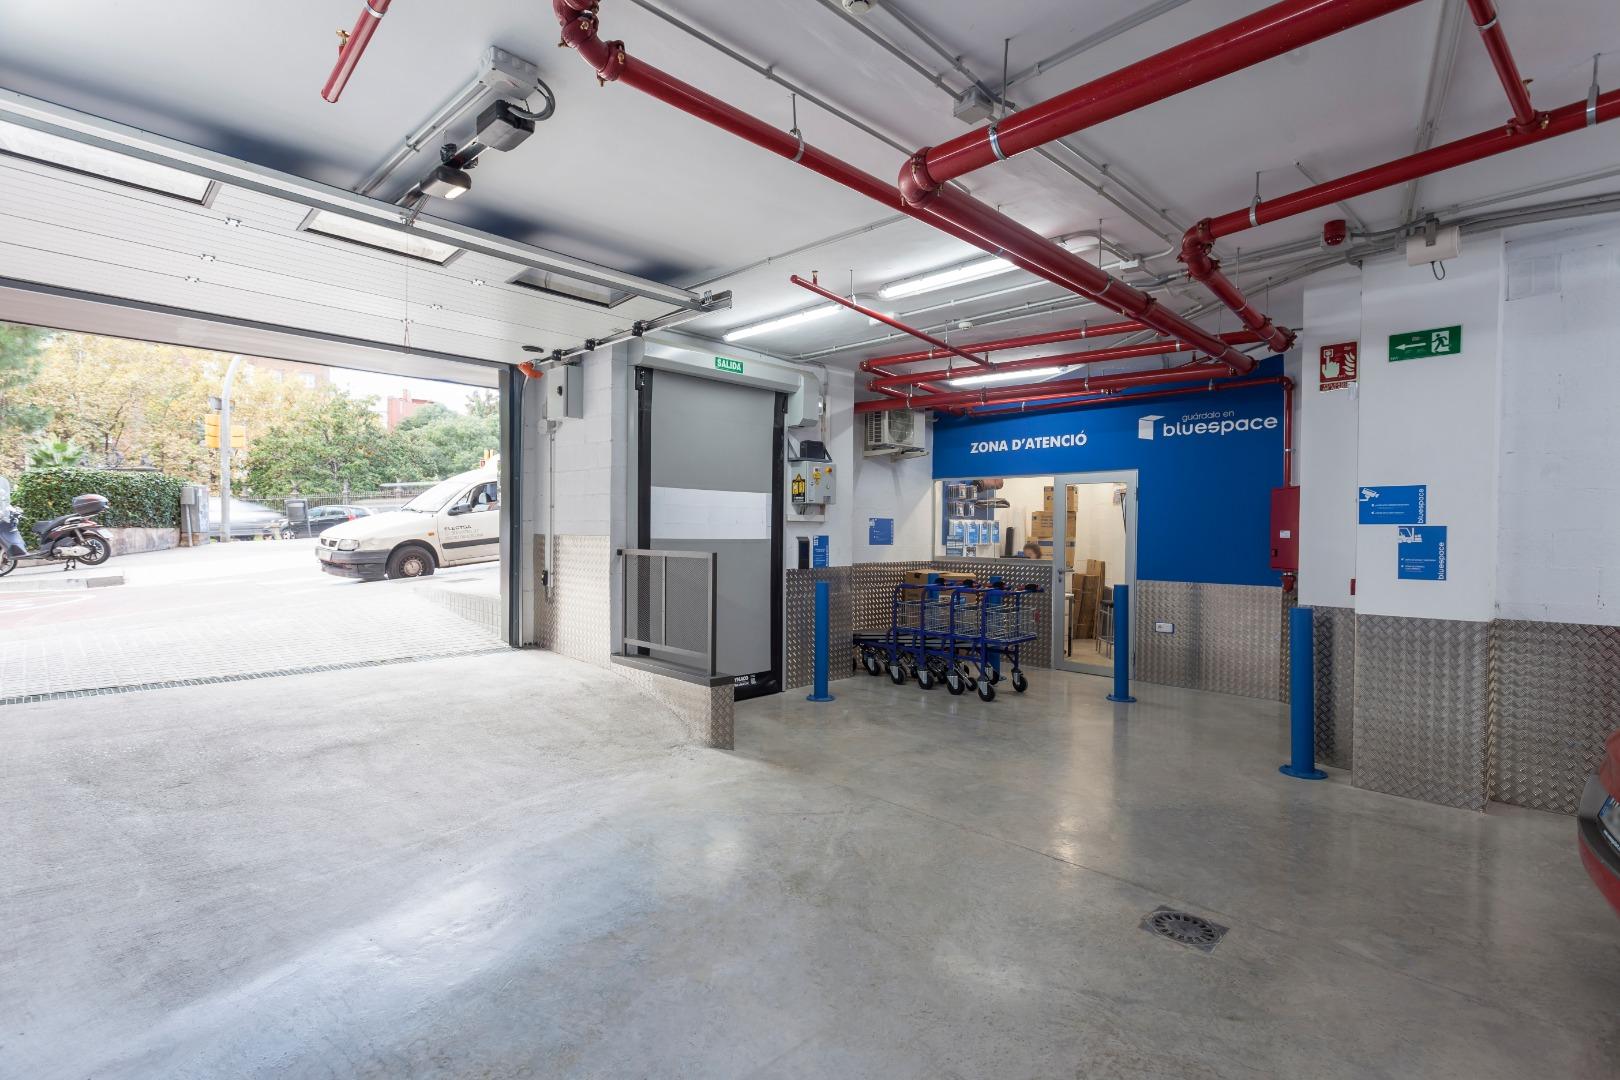 Location Entrepôt  Calle teodora lamadrid , 52-54. Trasteros bluespace , de 1 m2 en st.gervasi (barcelona) ¡reserv